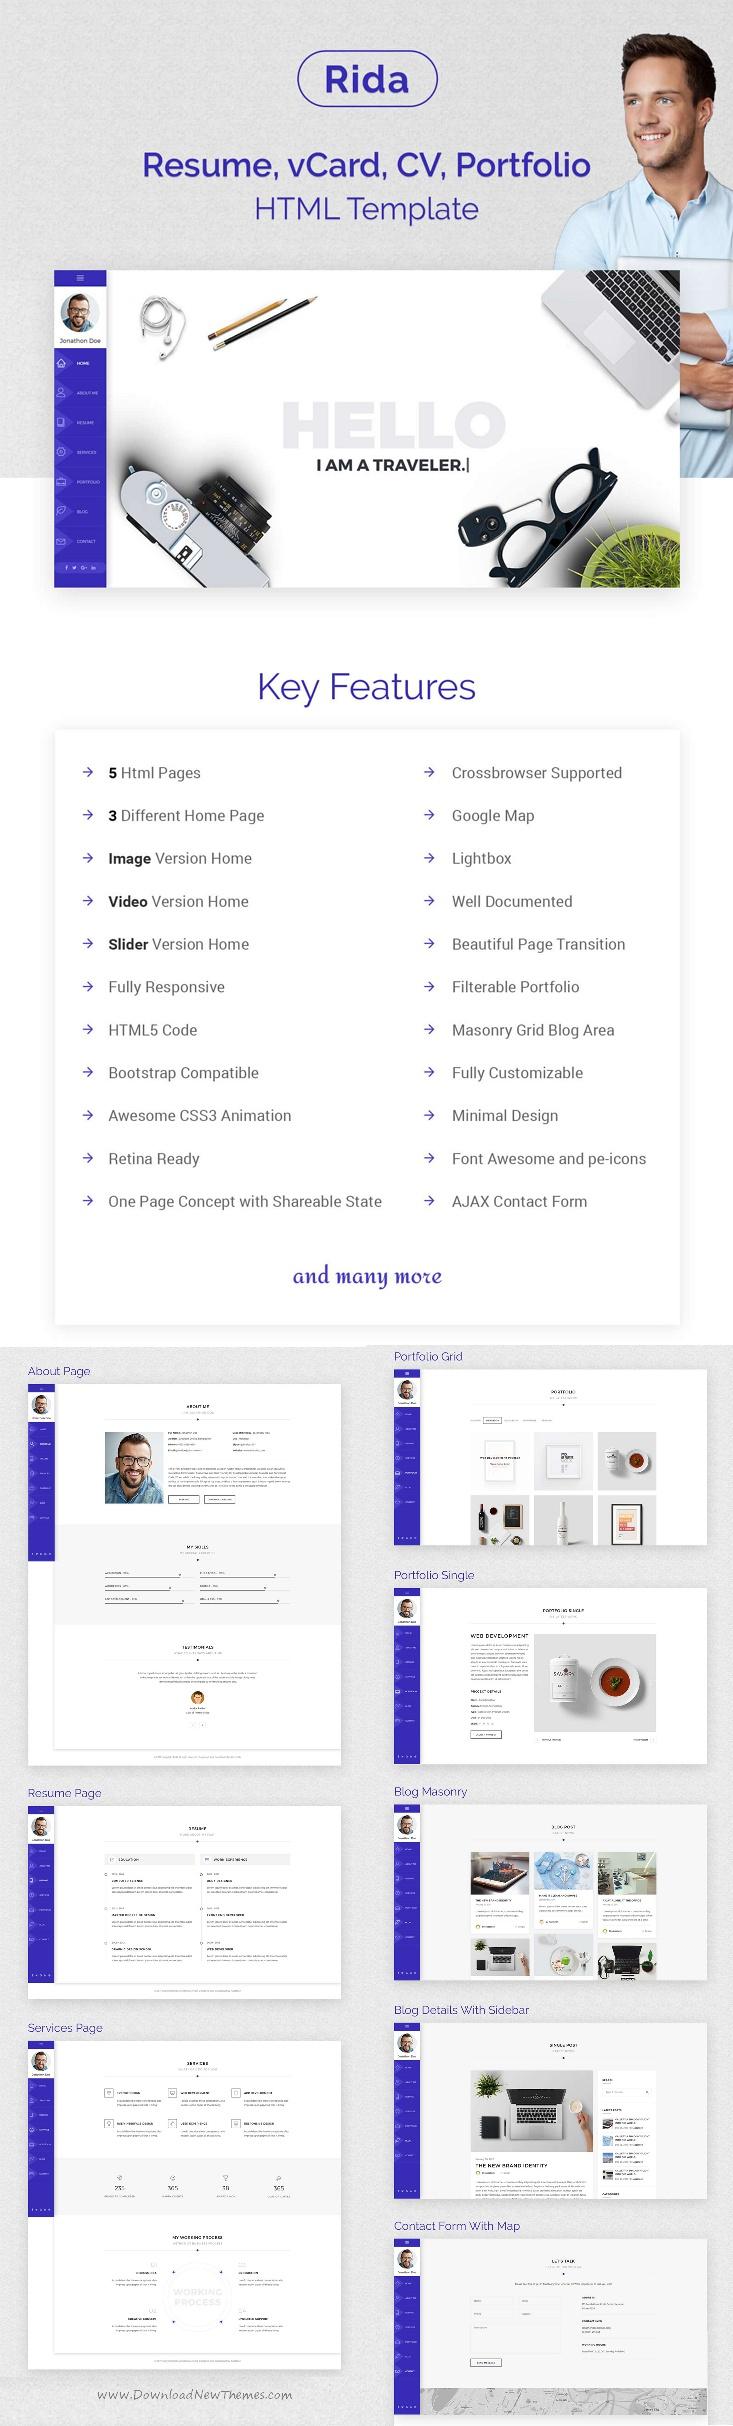 Rida Vcard  Responsive Html PortfolioResume Template  Resume